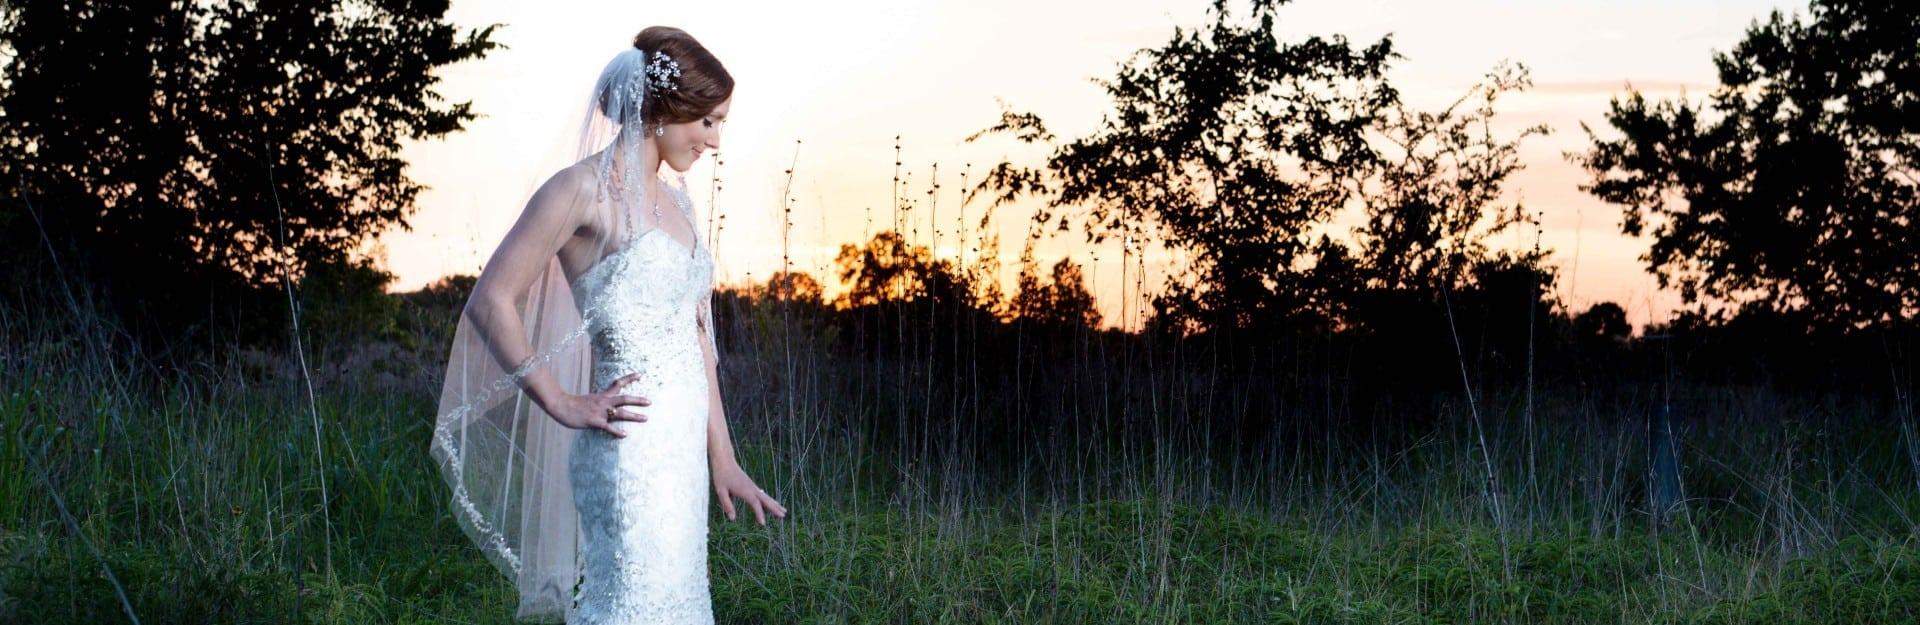 San Antonio wedding planning, San Antonio wedding, Day of wedding planner, San Antonio wedding coordinator, Weddings